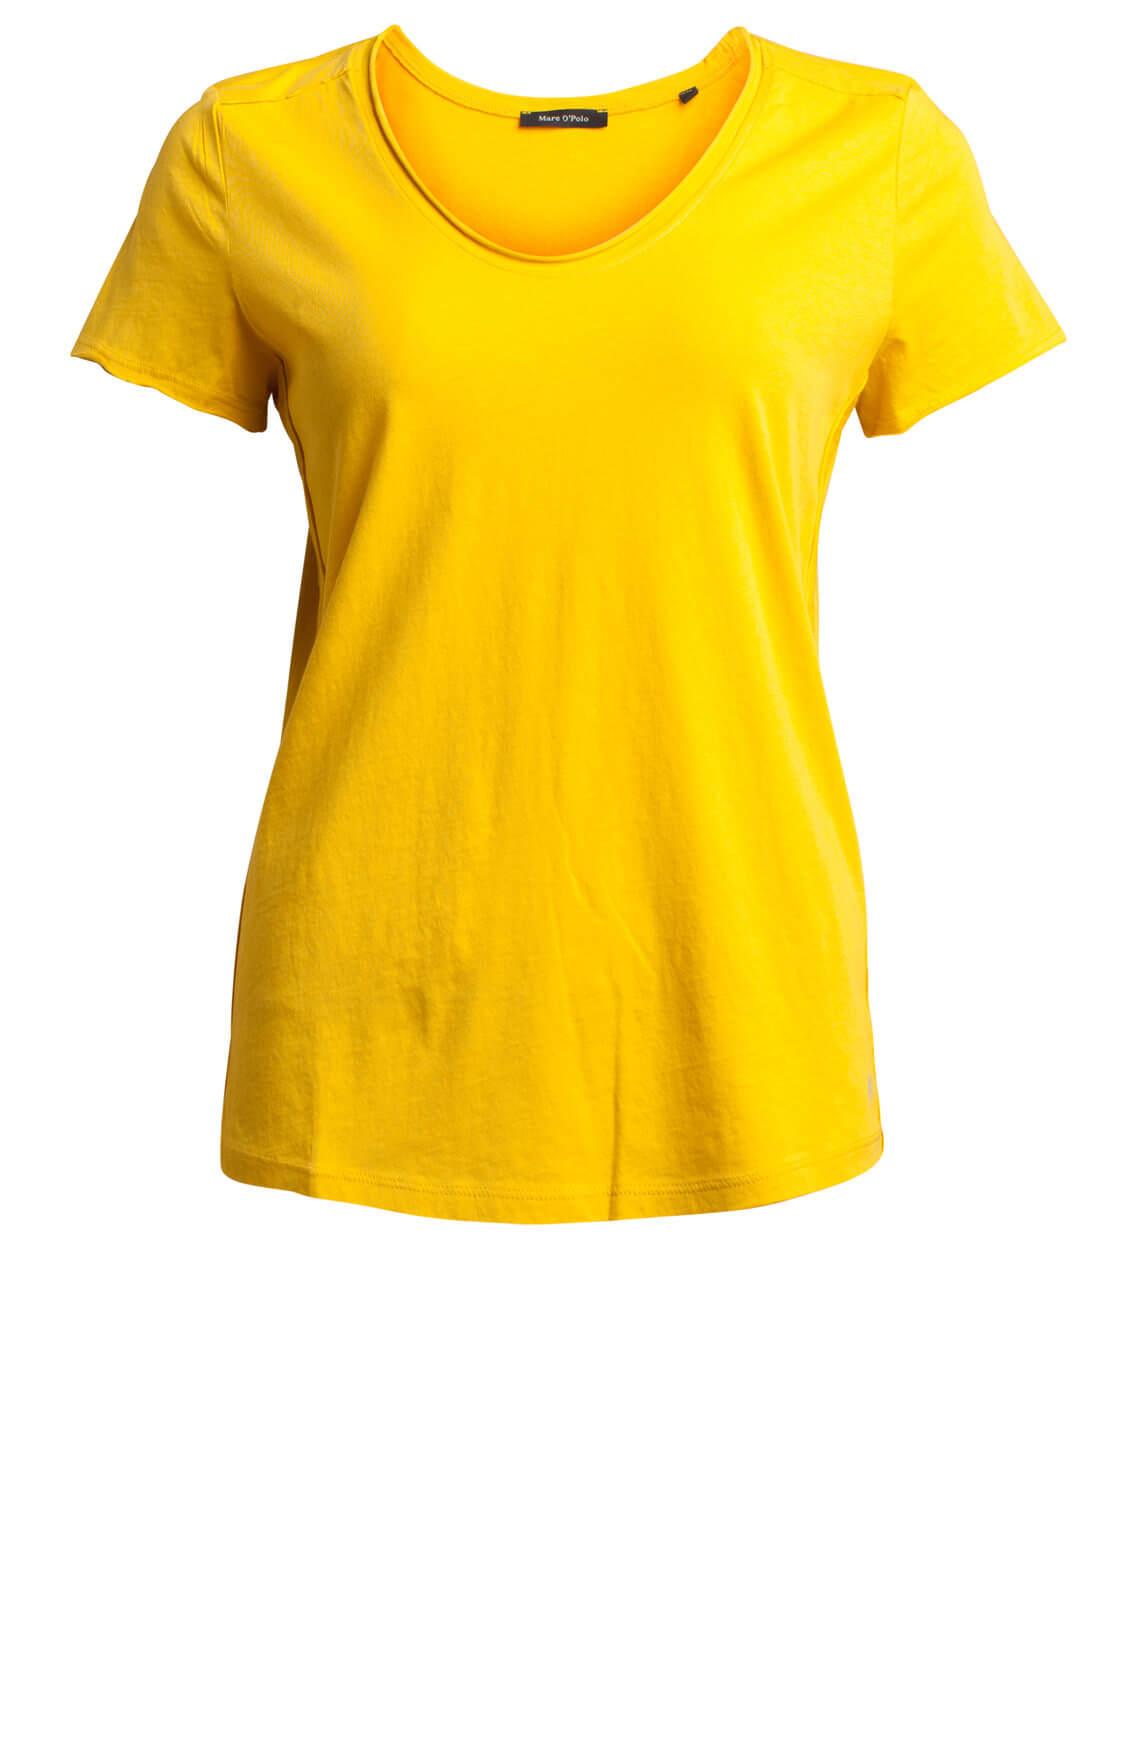 Marc O'Polo Dames Shirt met v-hals geel